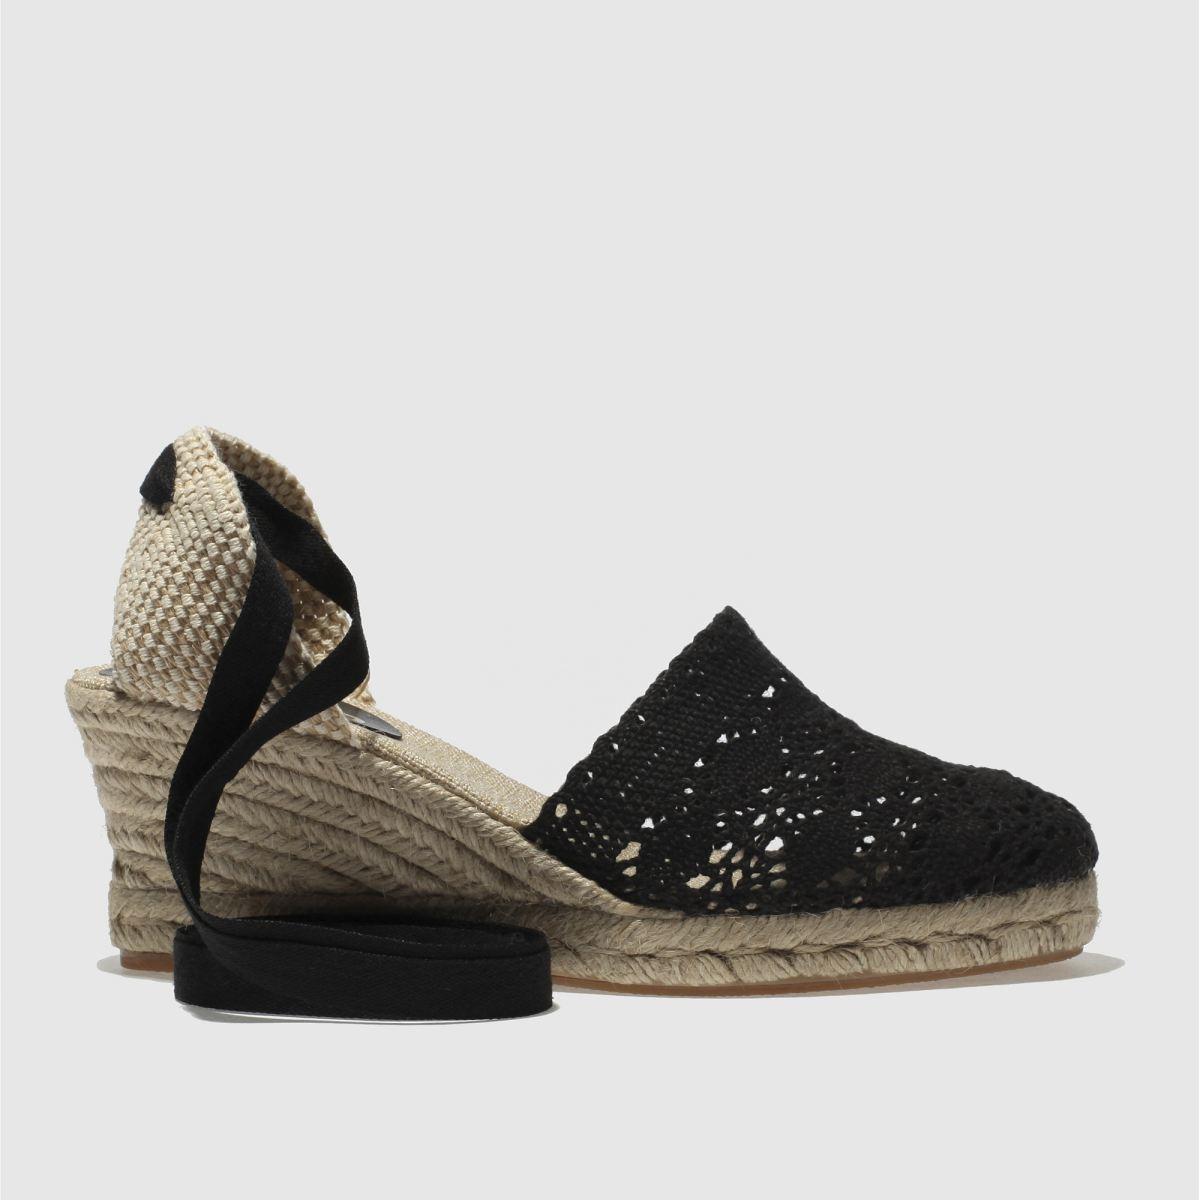 Schuh Black Parade Ii Sandals